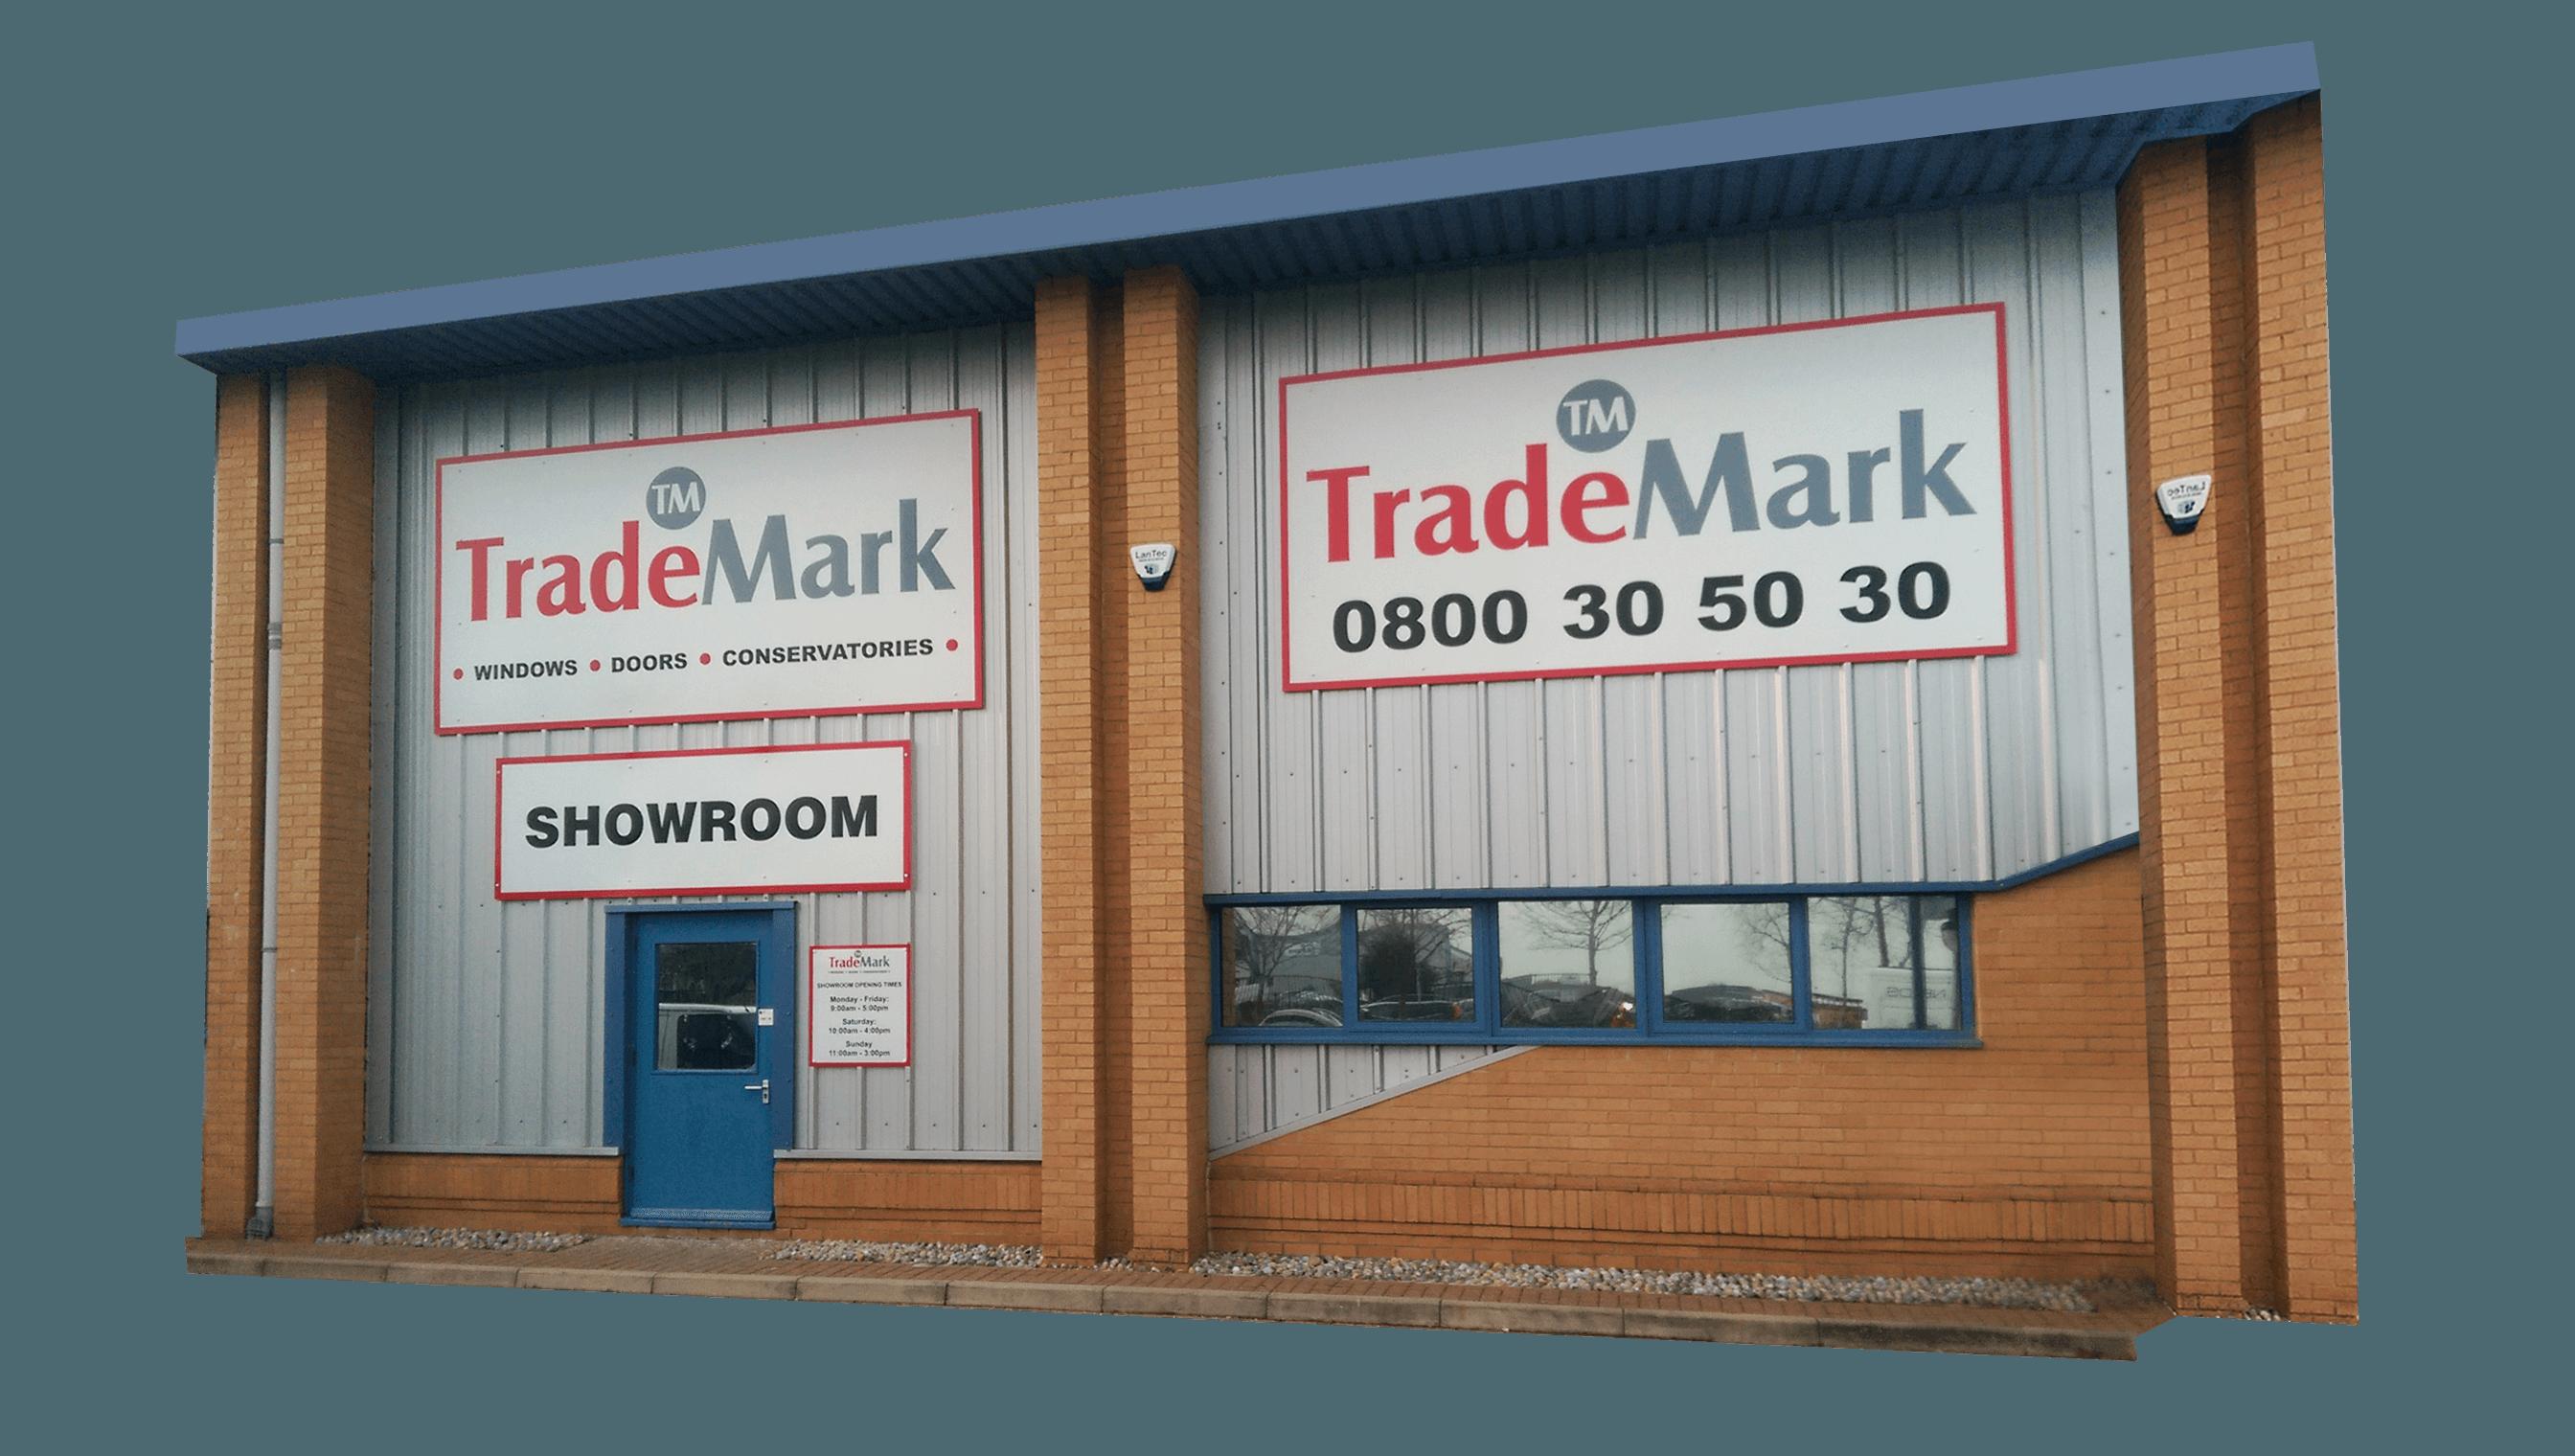 Stylish TradeMark logo